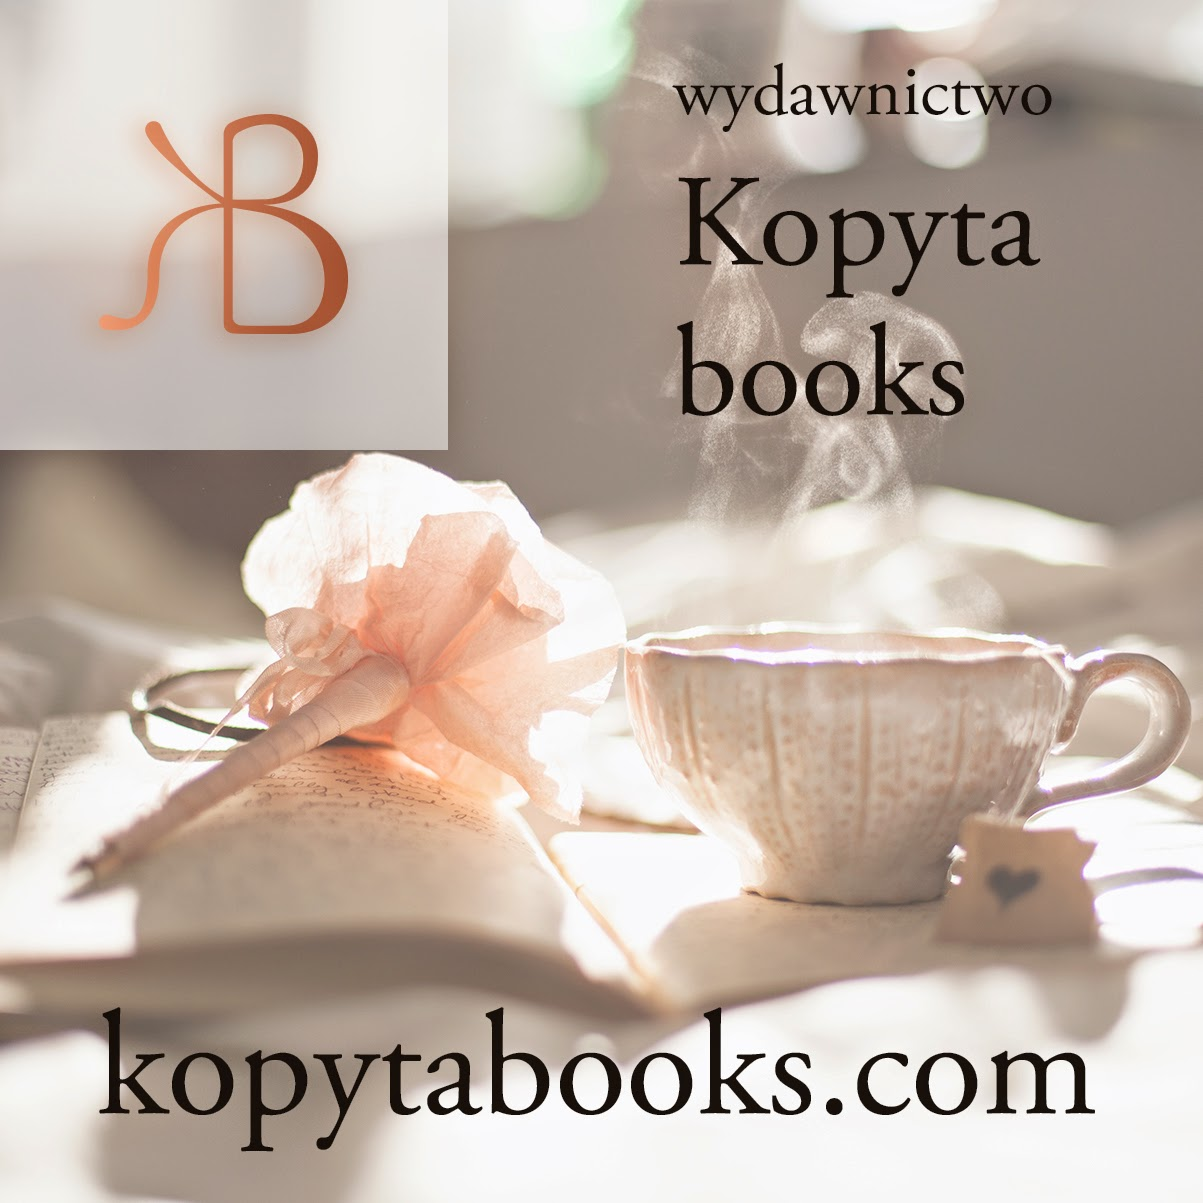 http://www.kopytabooks.com/